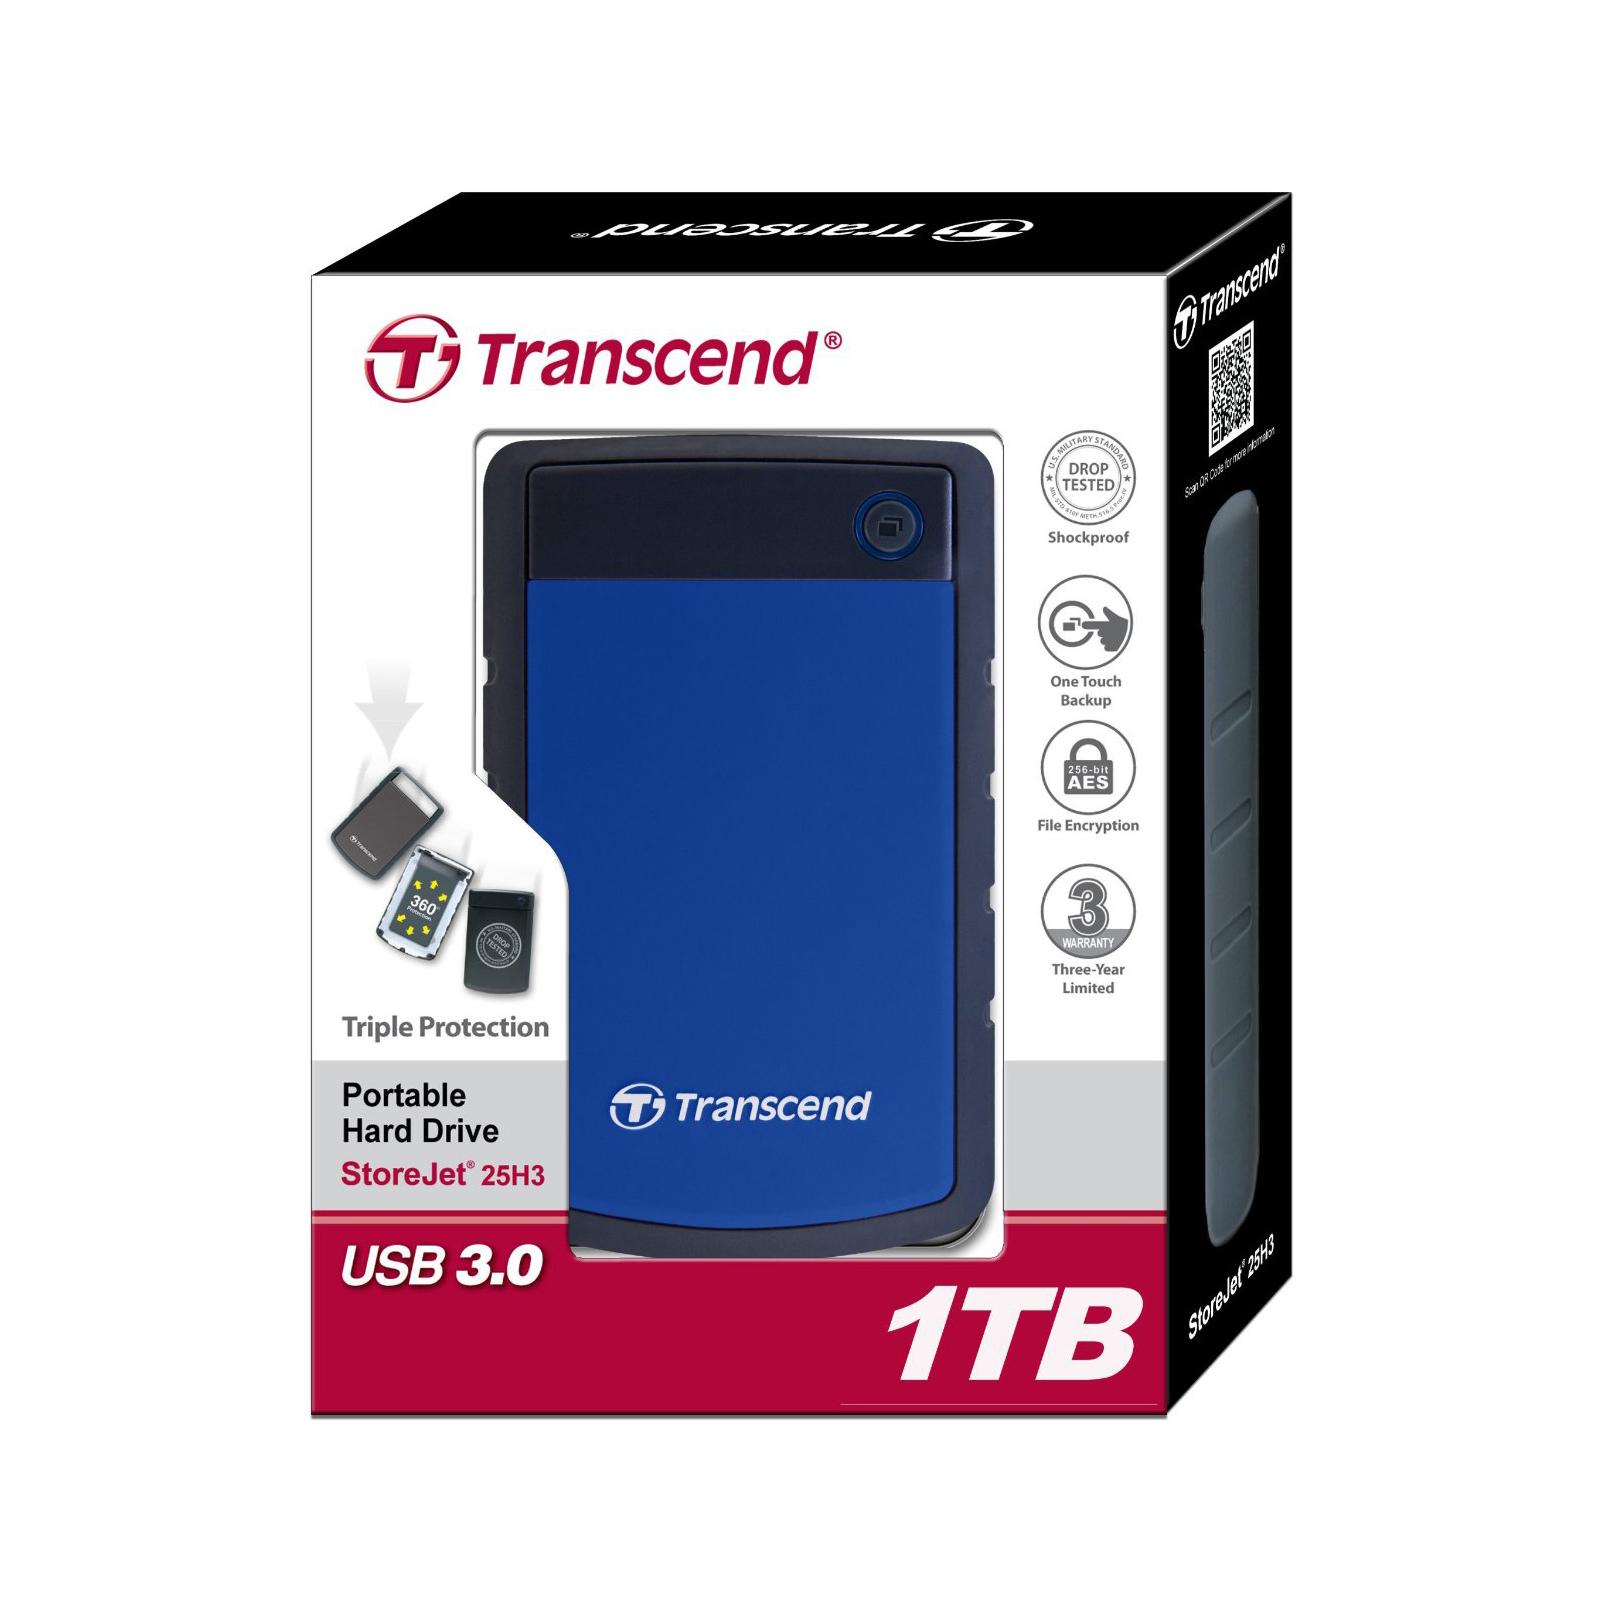 "Внешний жесткий диск 2.5"" 1TB Transcend (TS1TSJ25H3B) изображение 5"